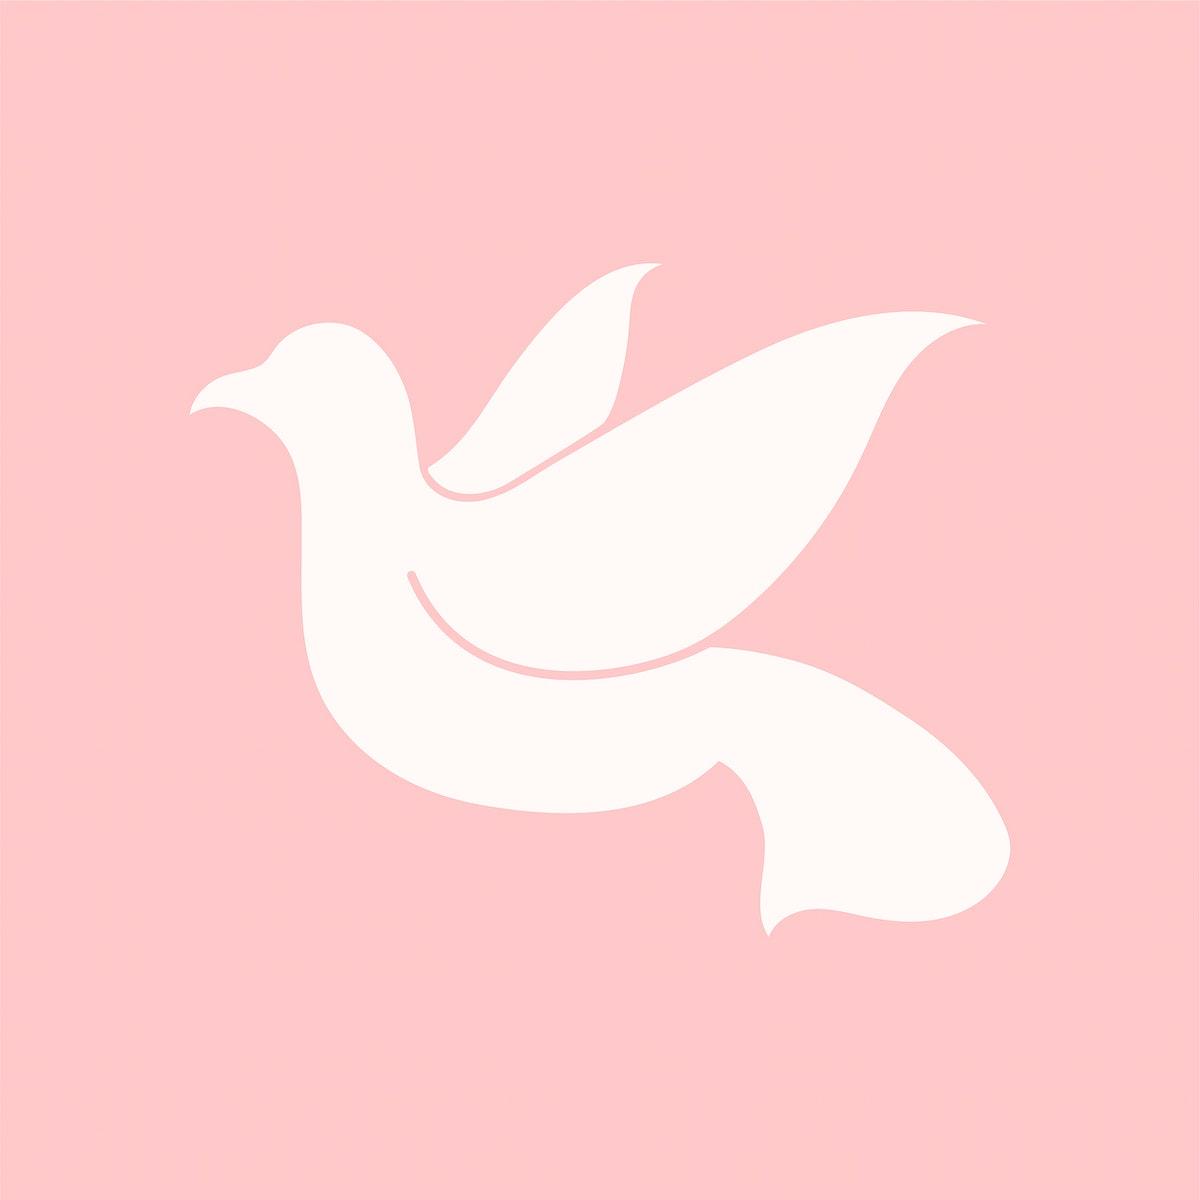 Dove symbol of peace illustration